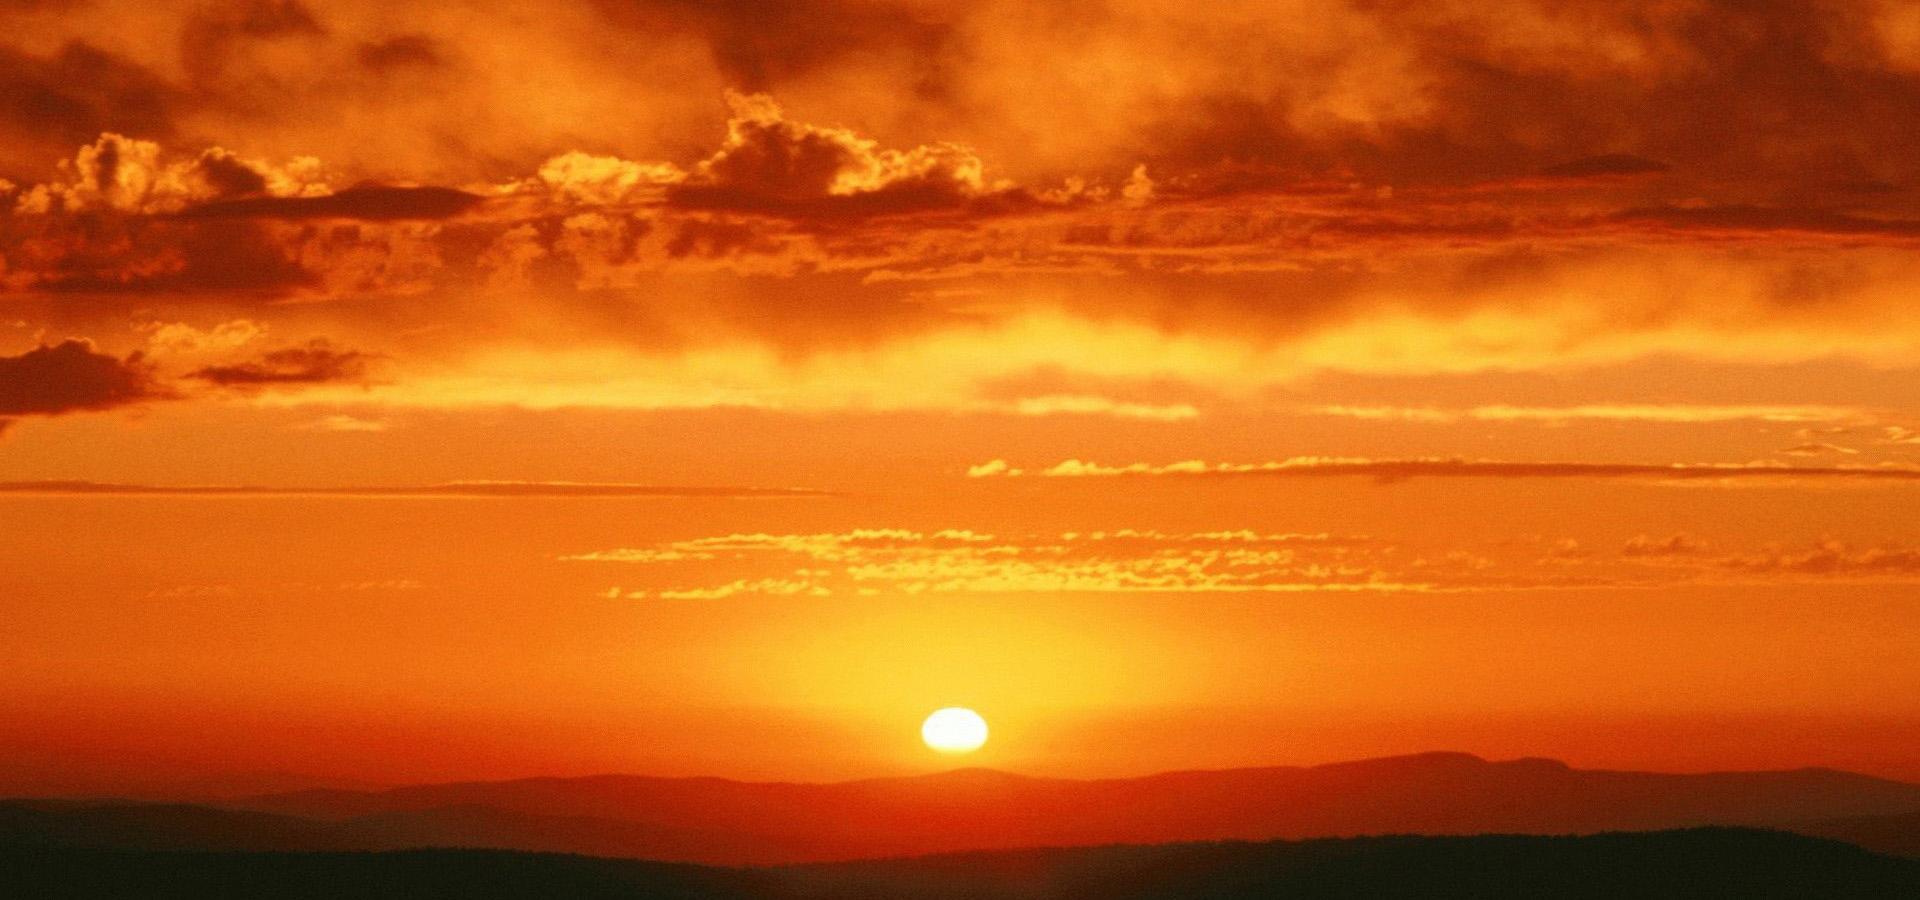 beautiful sunset background  sunset  sky  nature